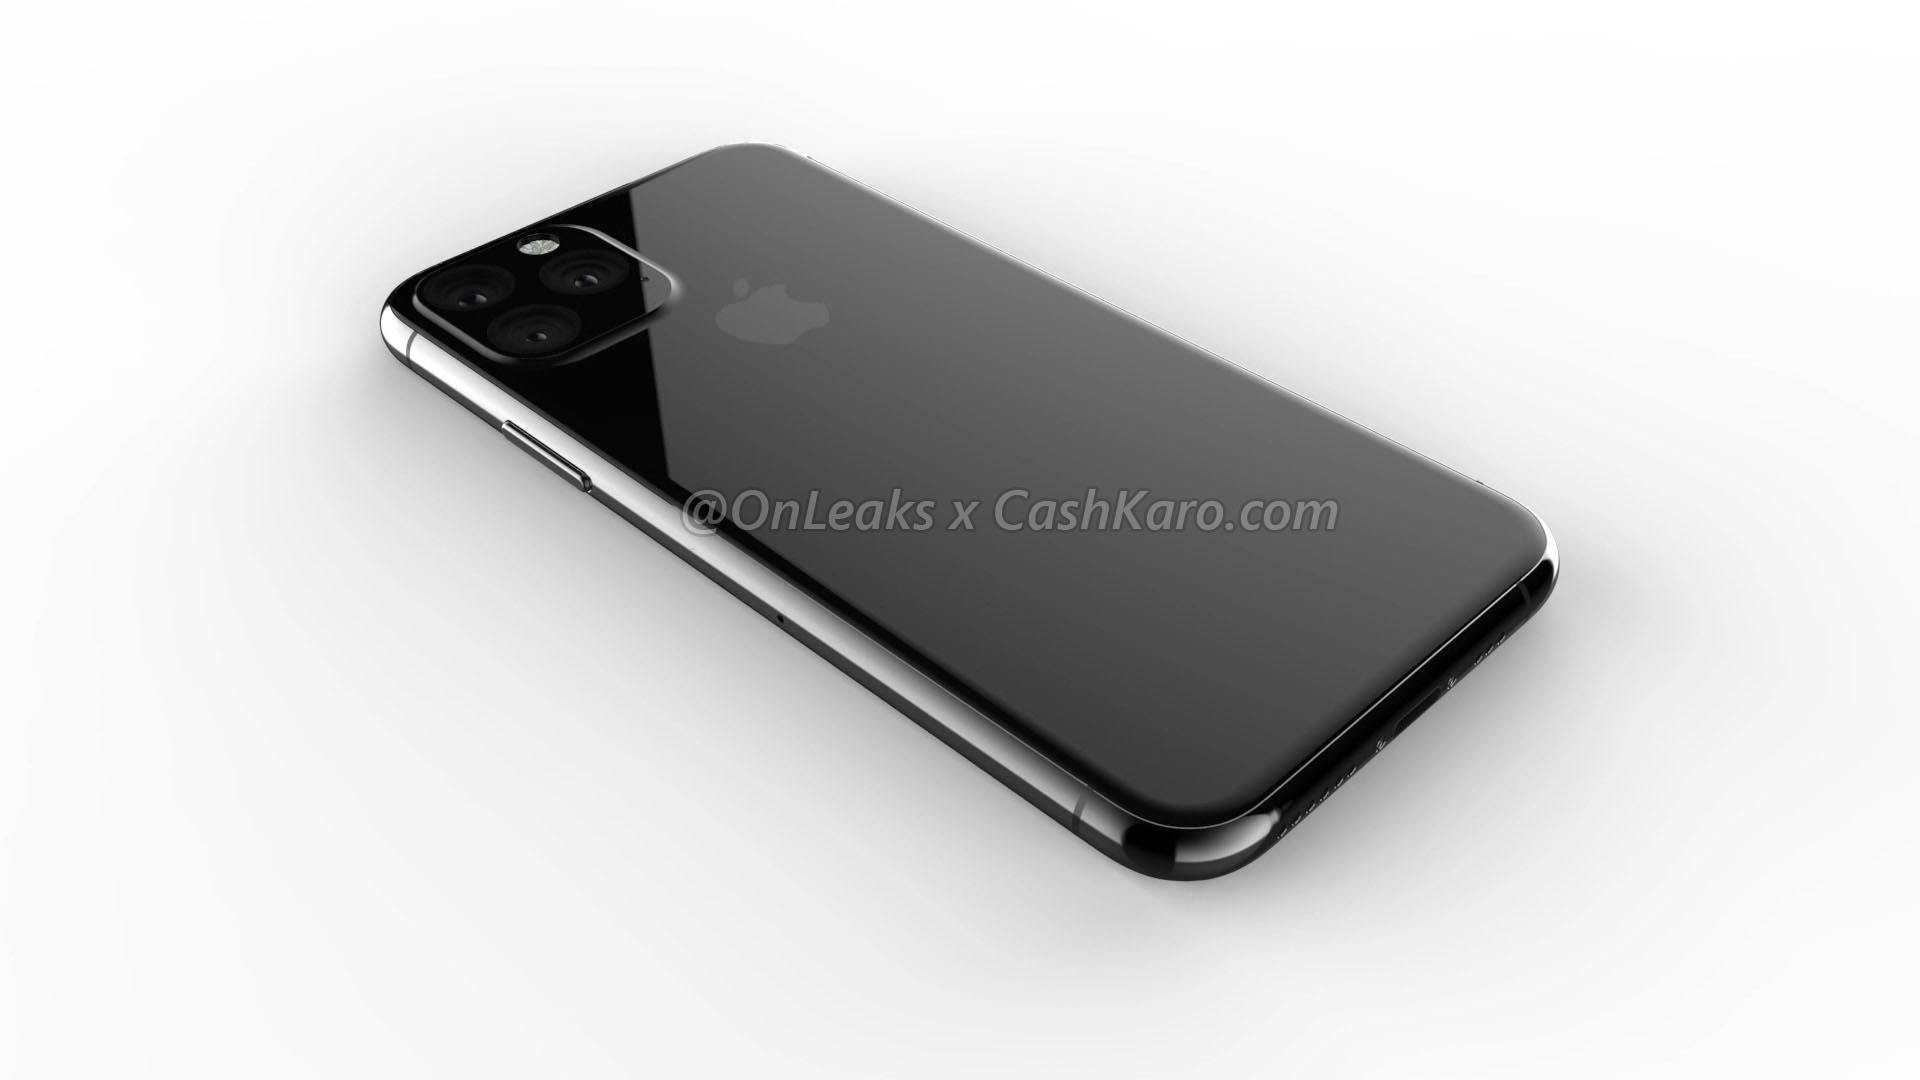 iPhone-XI-07 Cashkaro